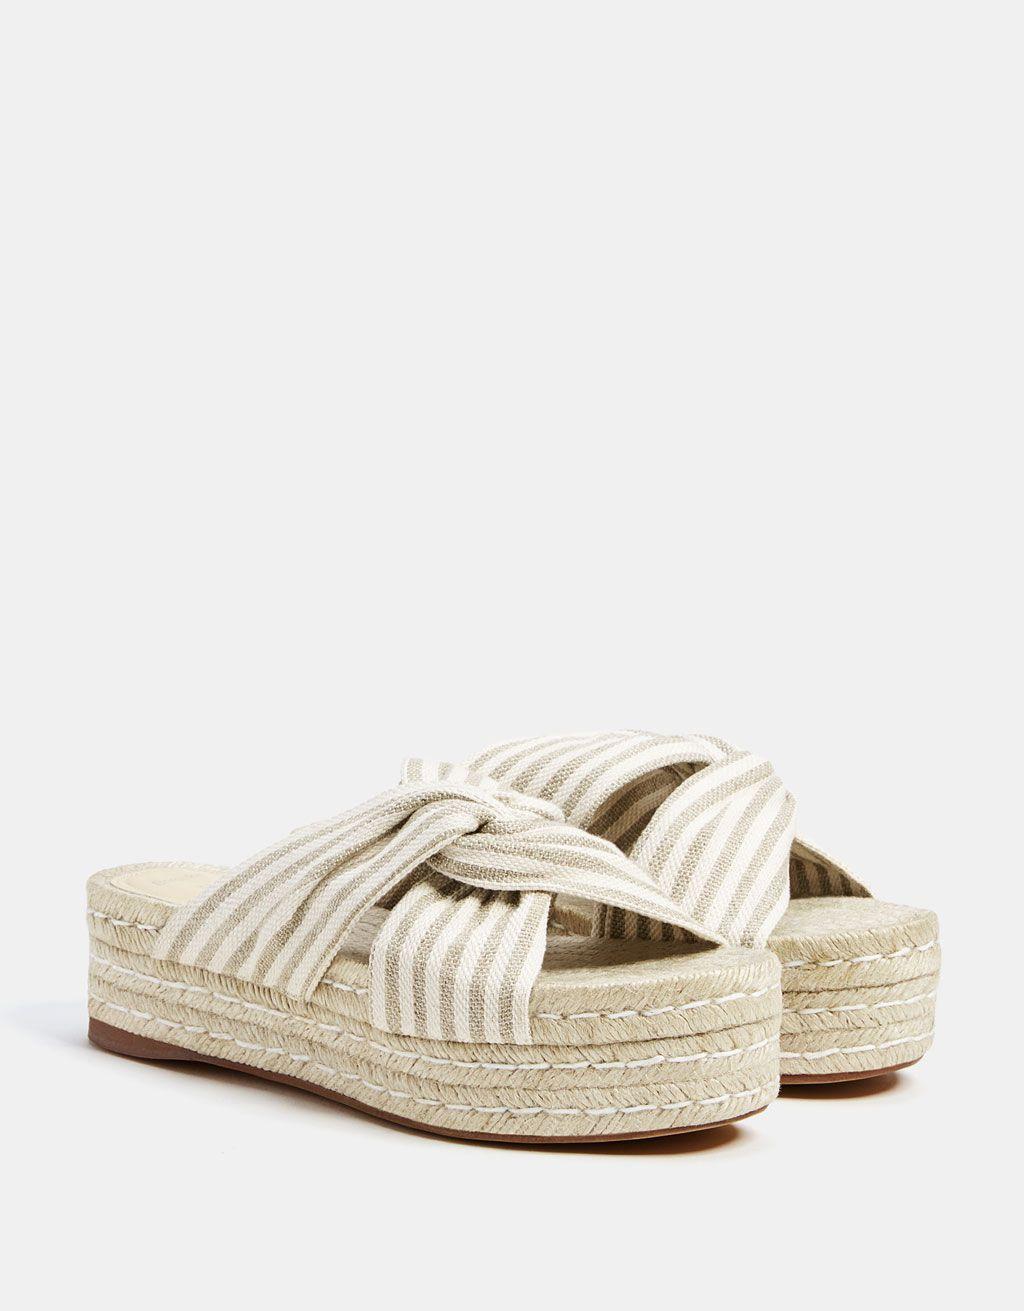 bajo precio 4da39 d50d0 Sandalia plataforma yute rayas | Zapatos-Plataformas en 2019 ...